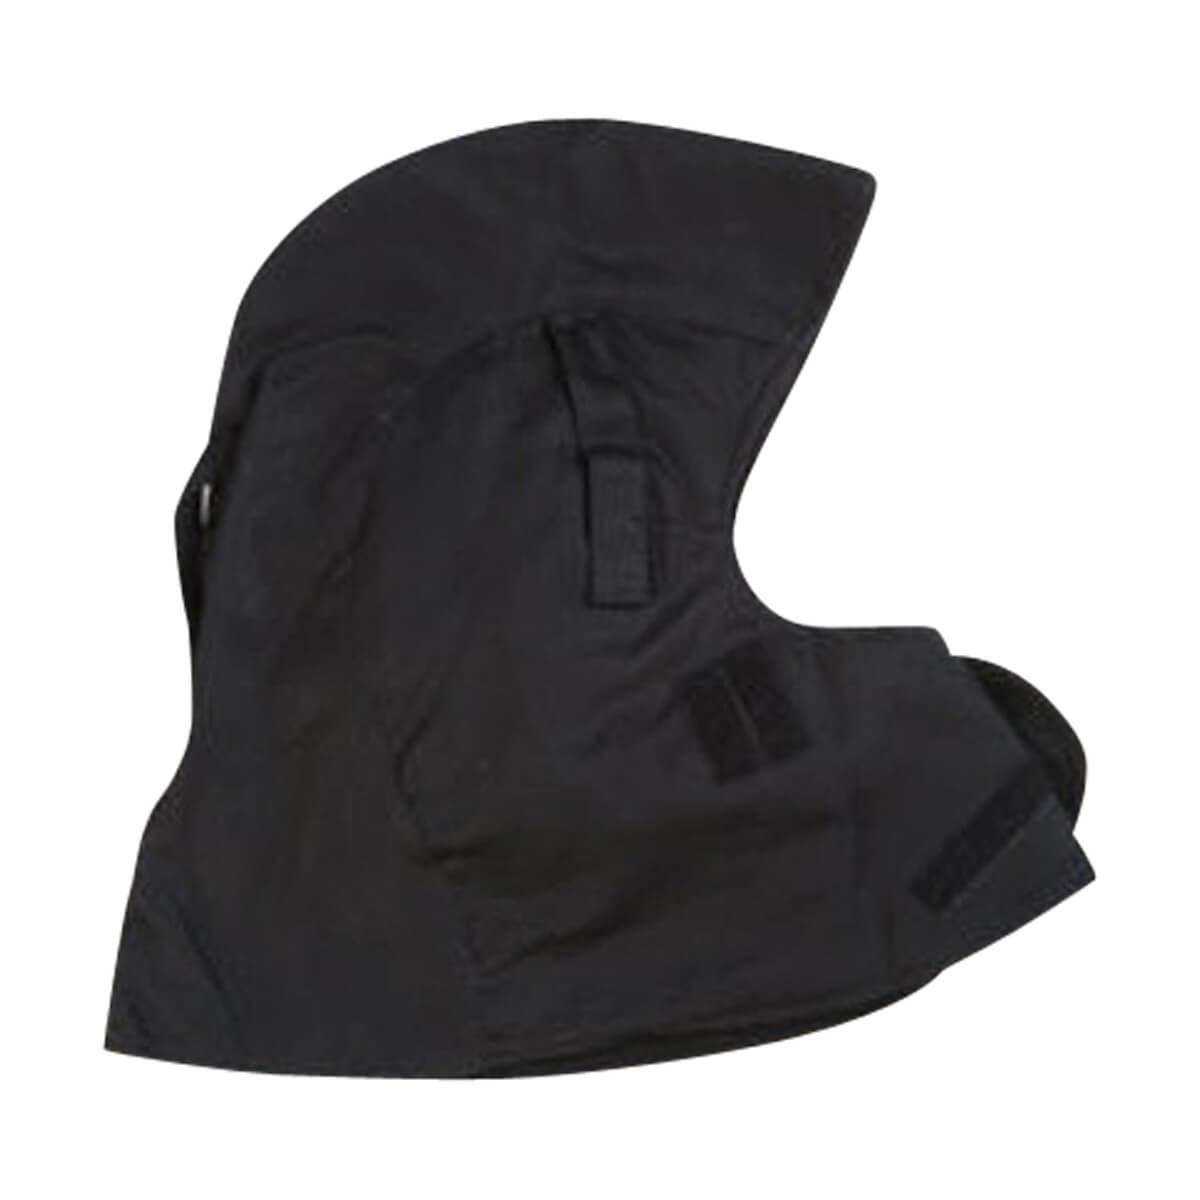 Helmet Liner with Removable Mask